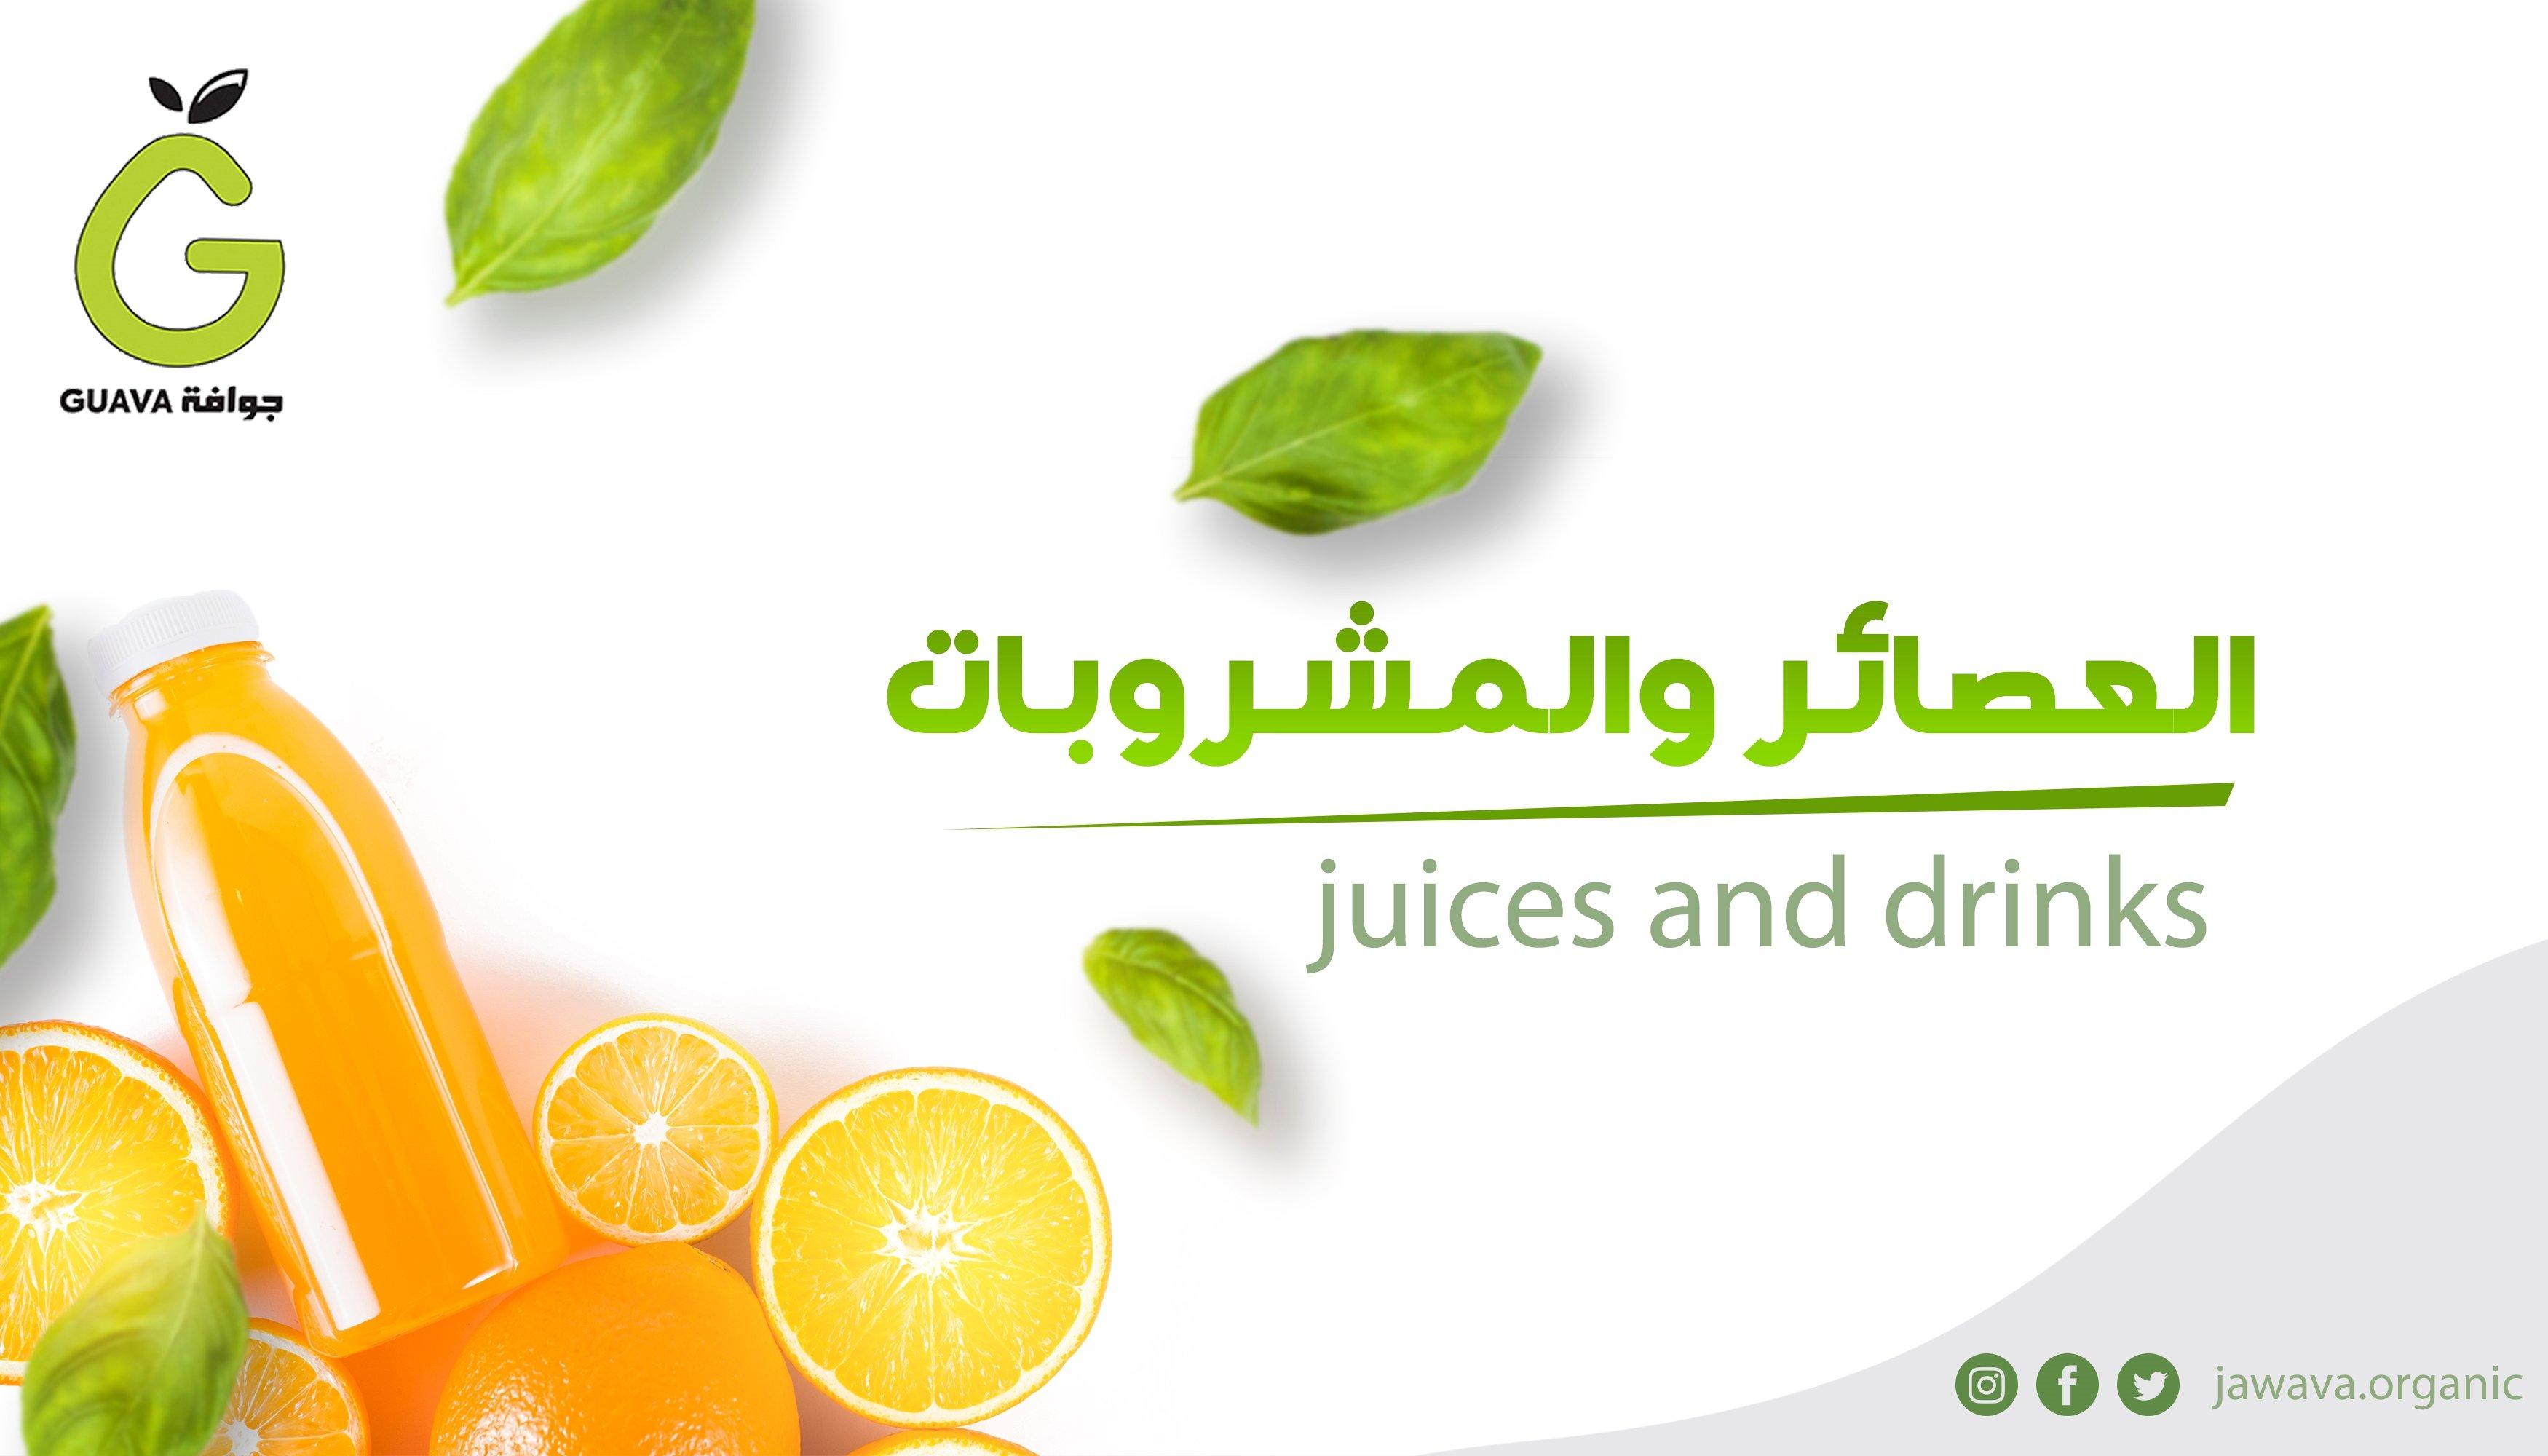 العصائر والمشروبات  drinks and juices